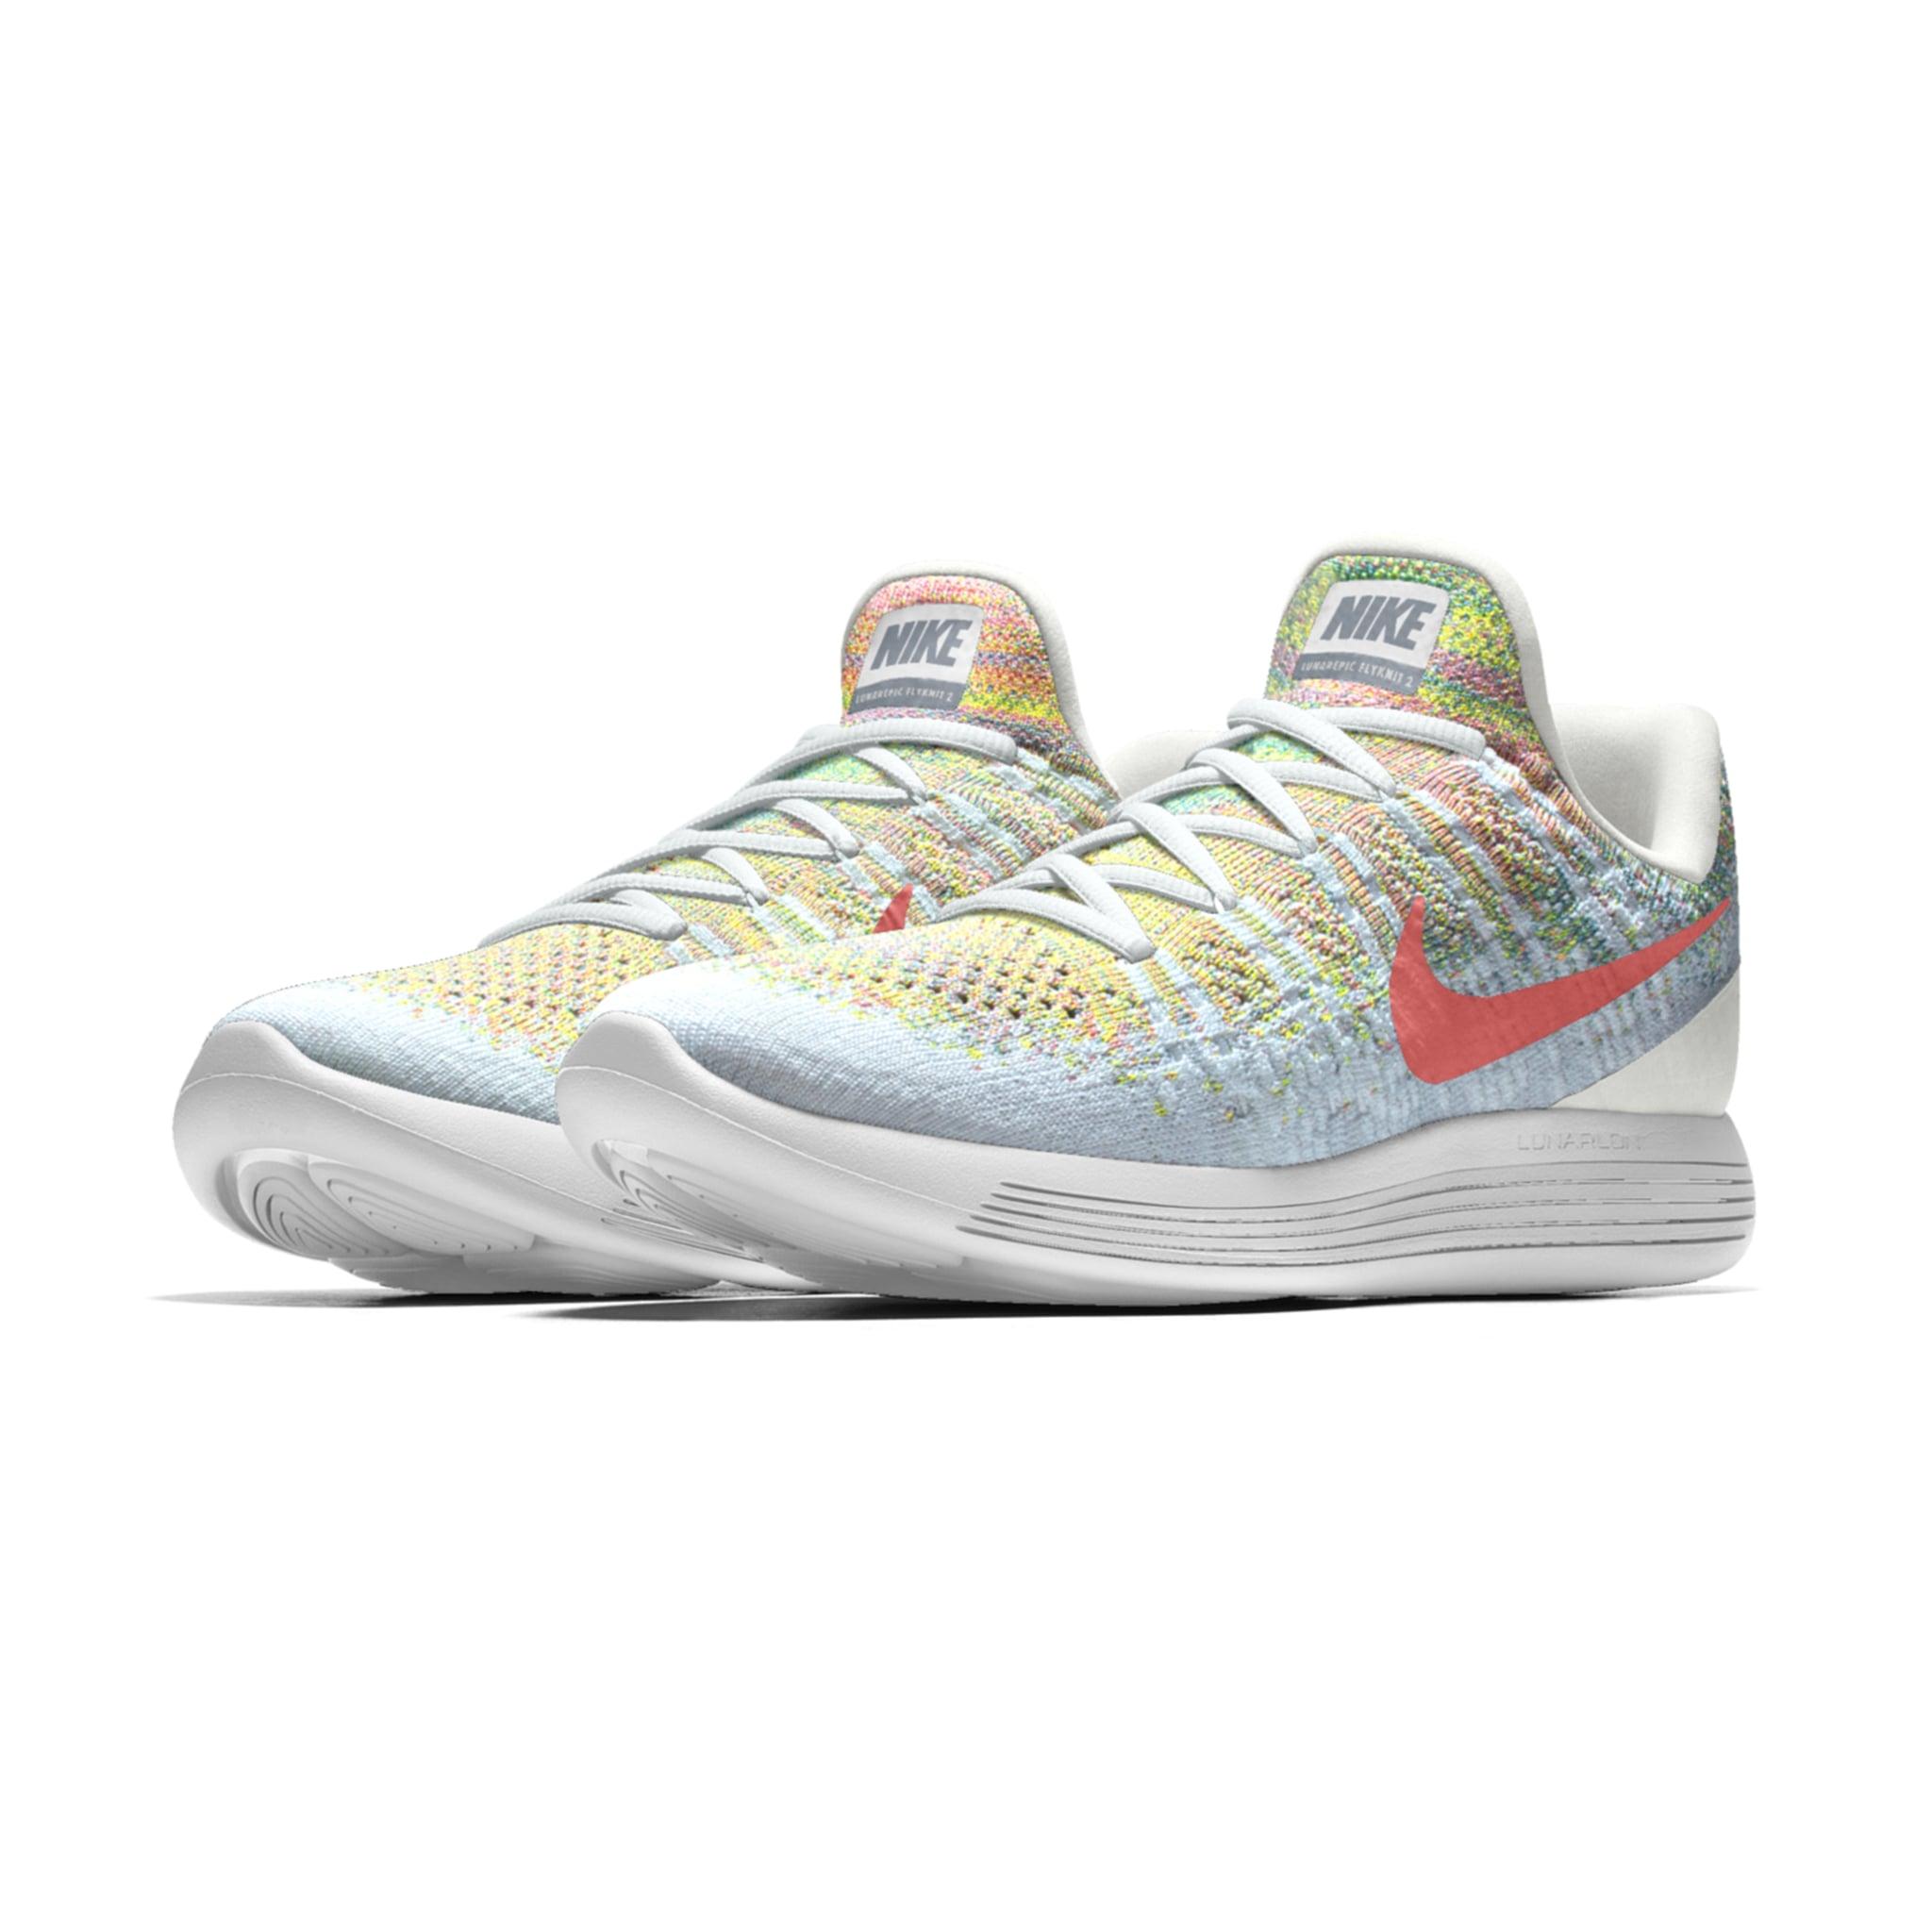 Pastel Nike Running Shoe Lunarepic Flyknit Low 2 iD  8154f4f53876